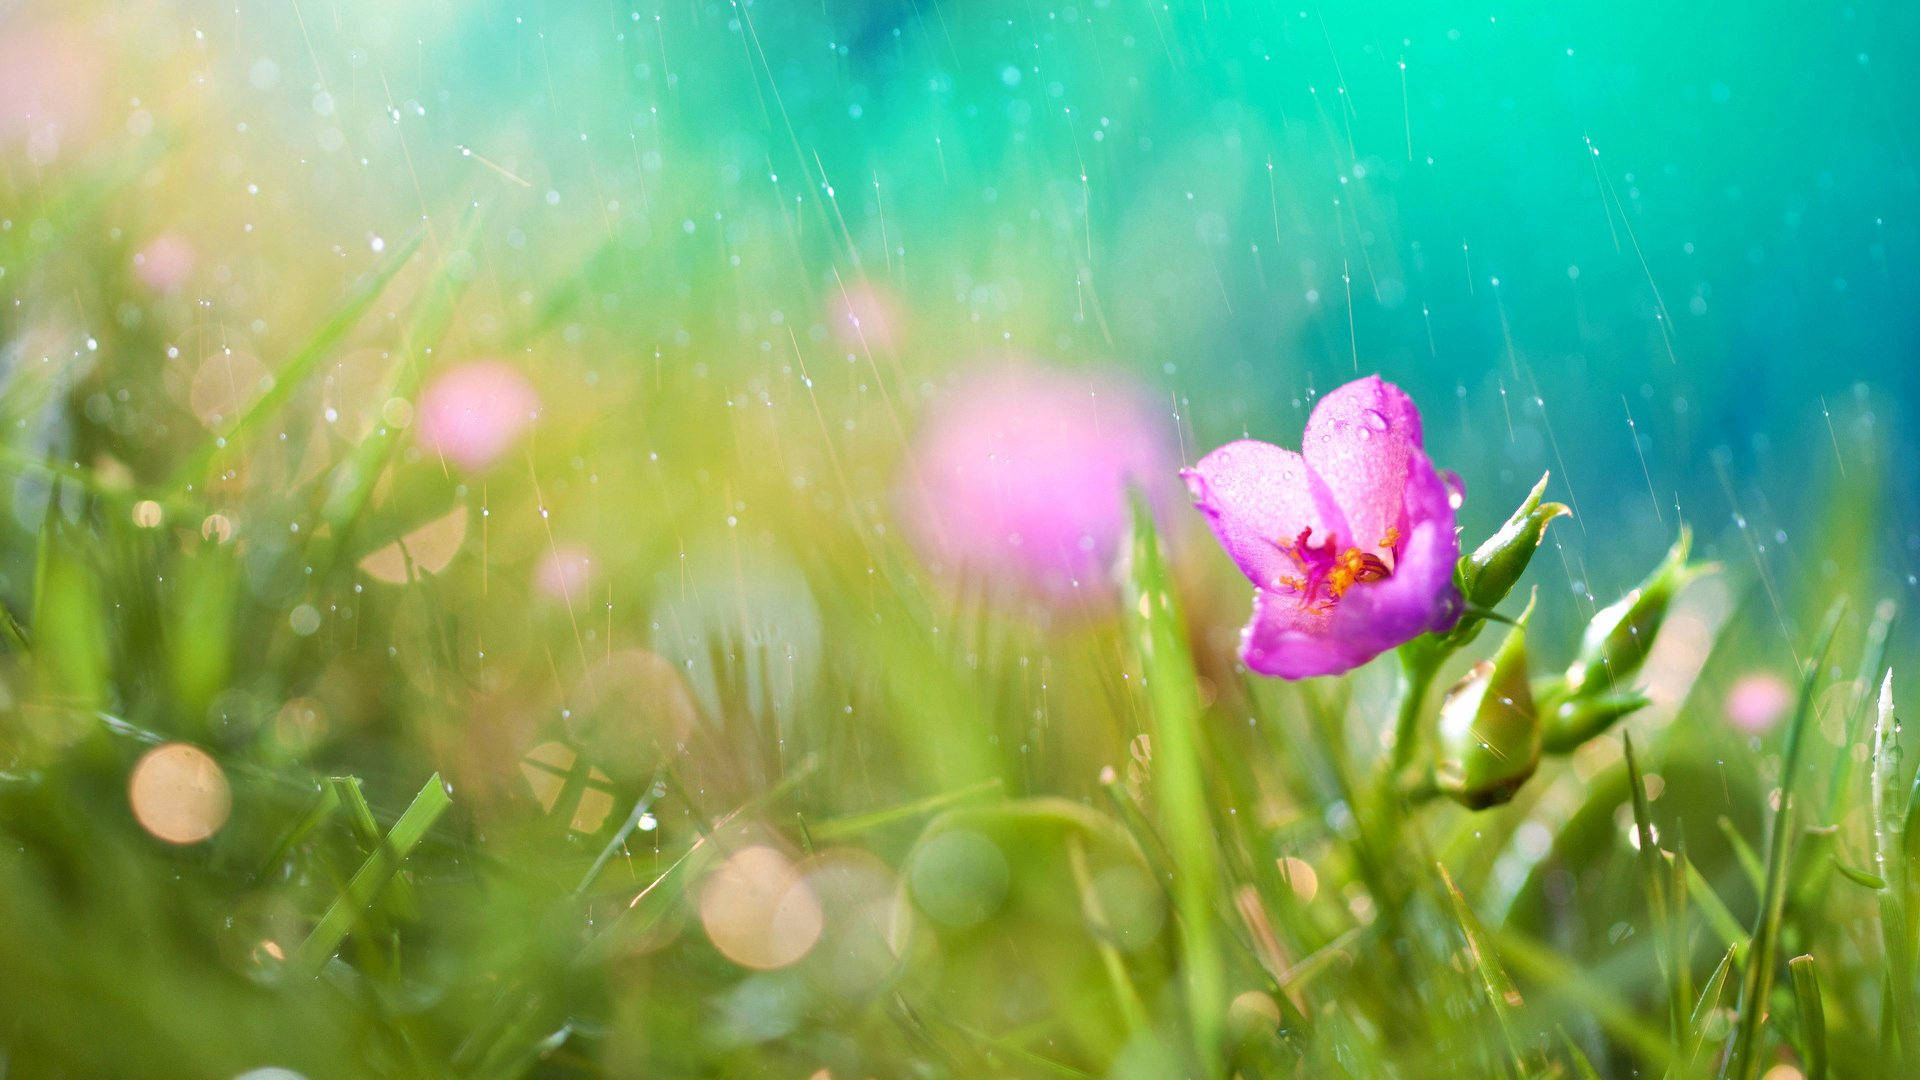 Free Download Wallpaper Desktop Flower Wallpapers Rainy Rain